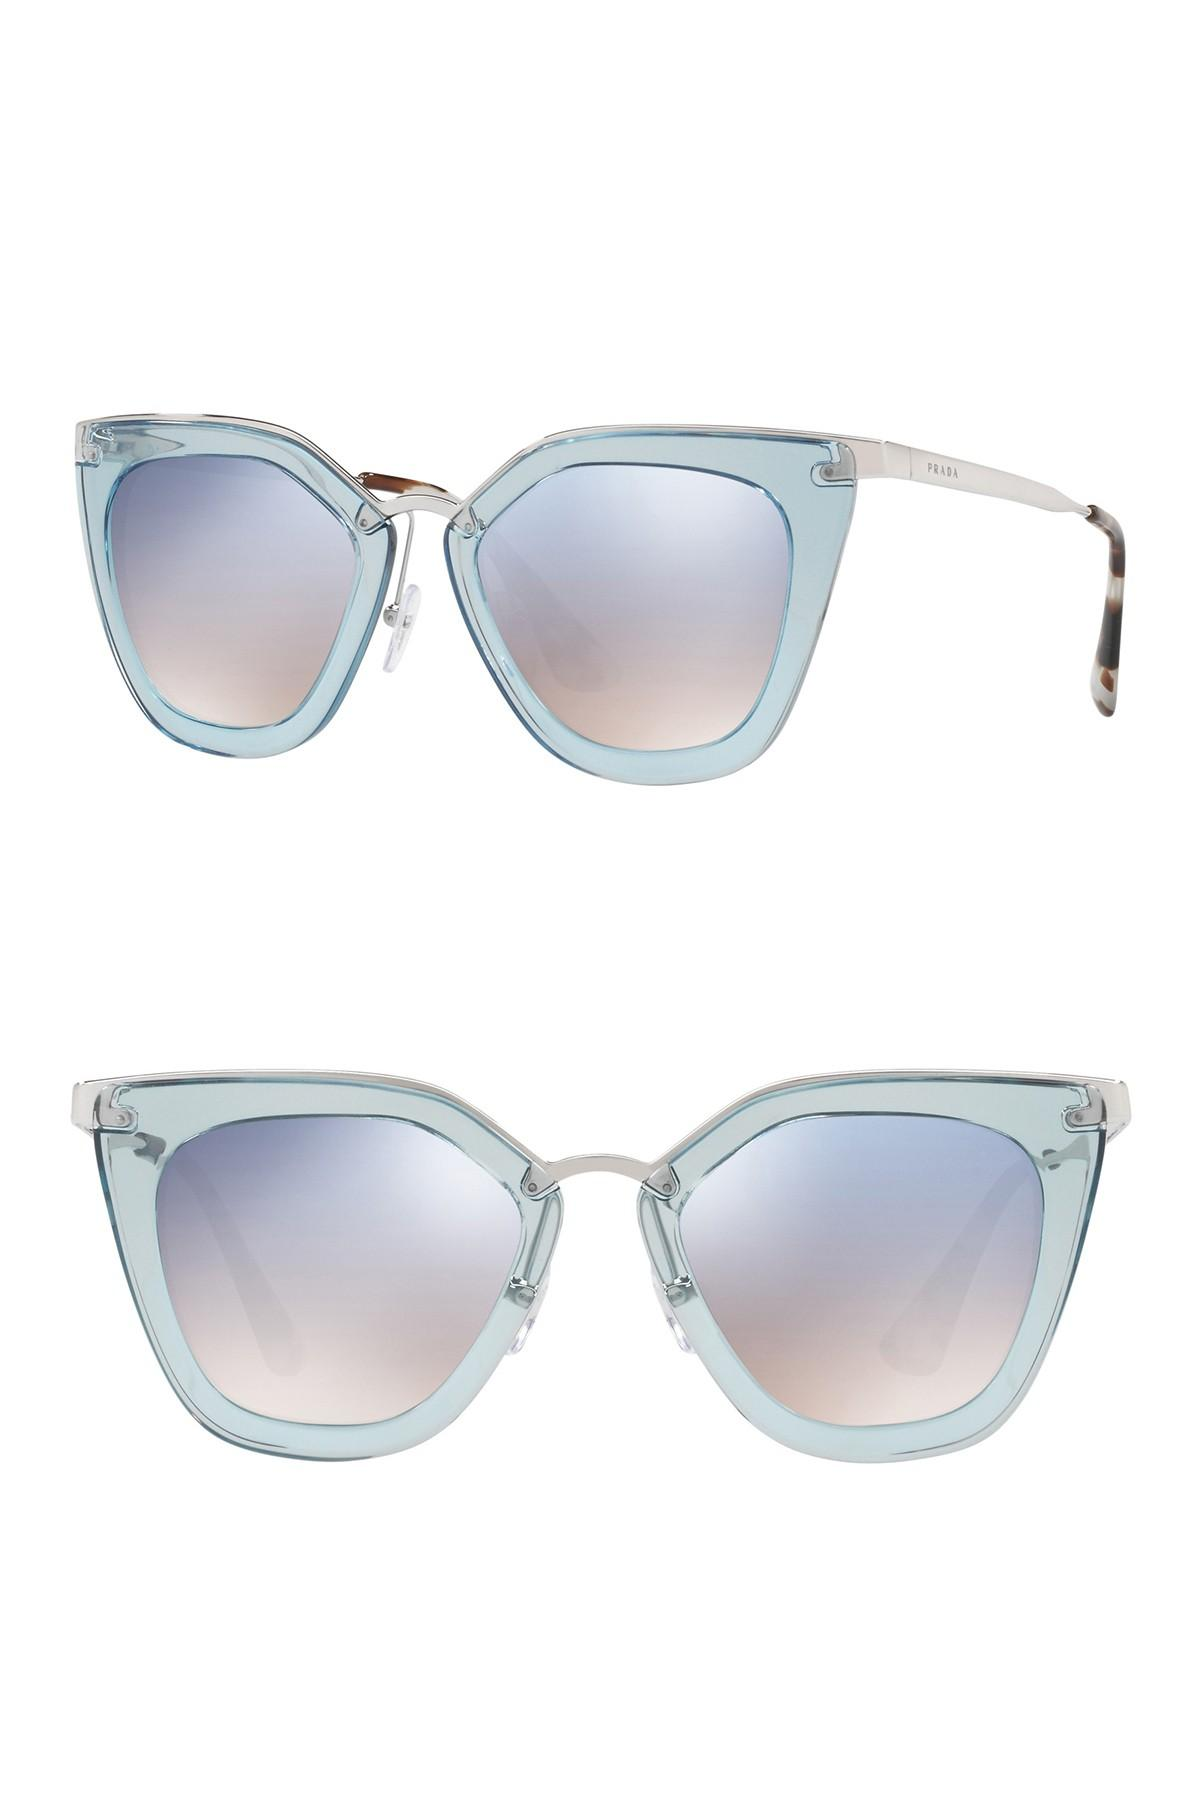 142c95efbf54 Lyst - Prada 52mm Retro Sunglasses in Blue